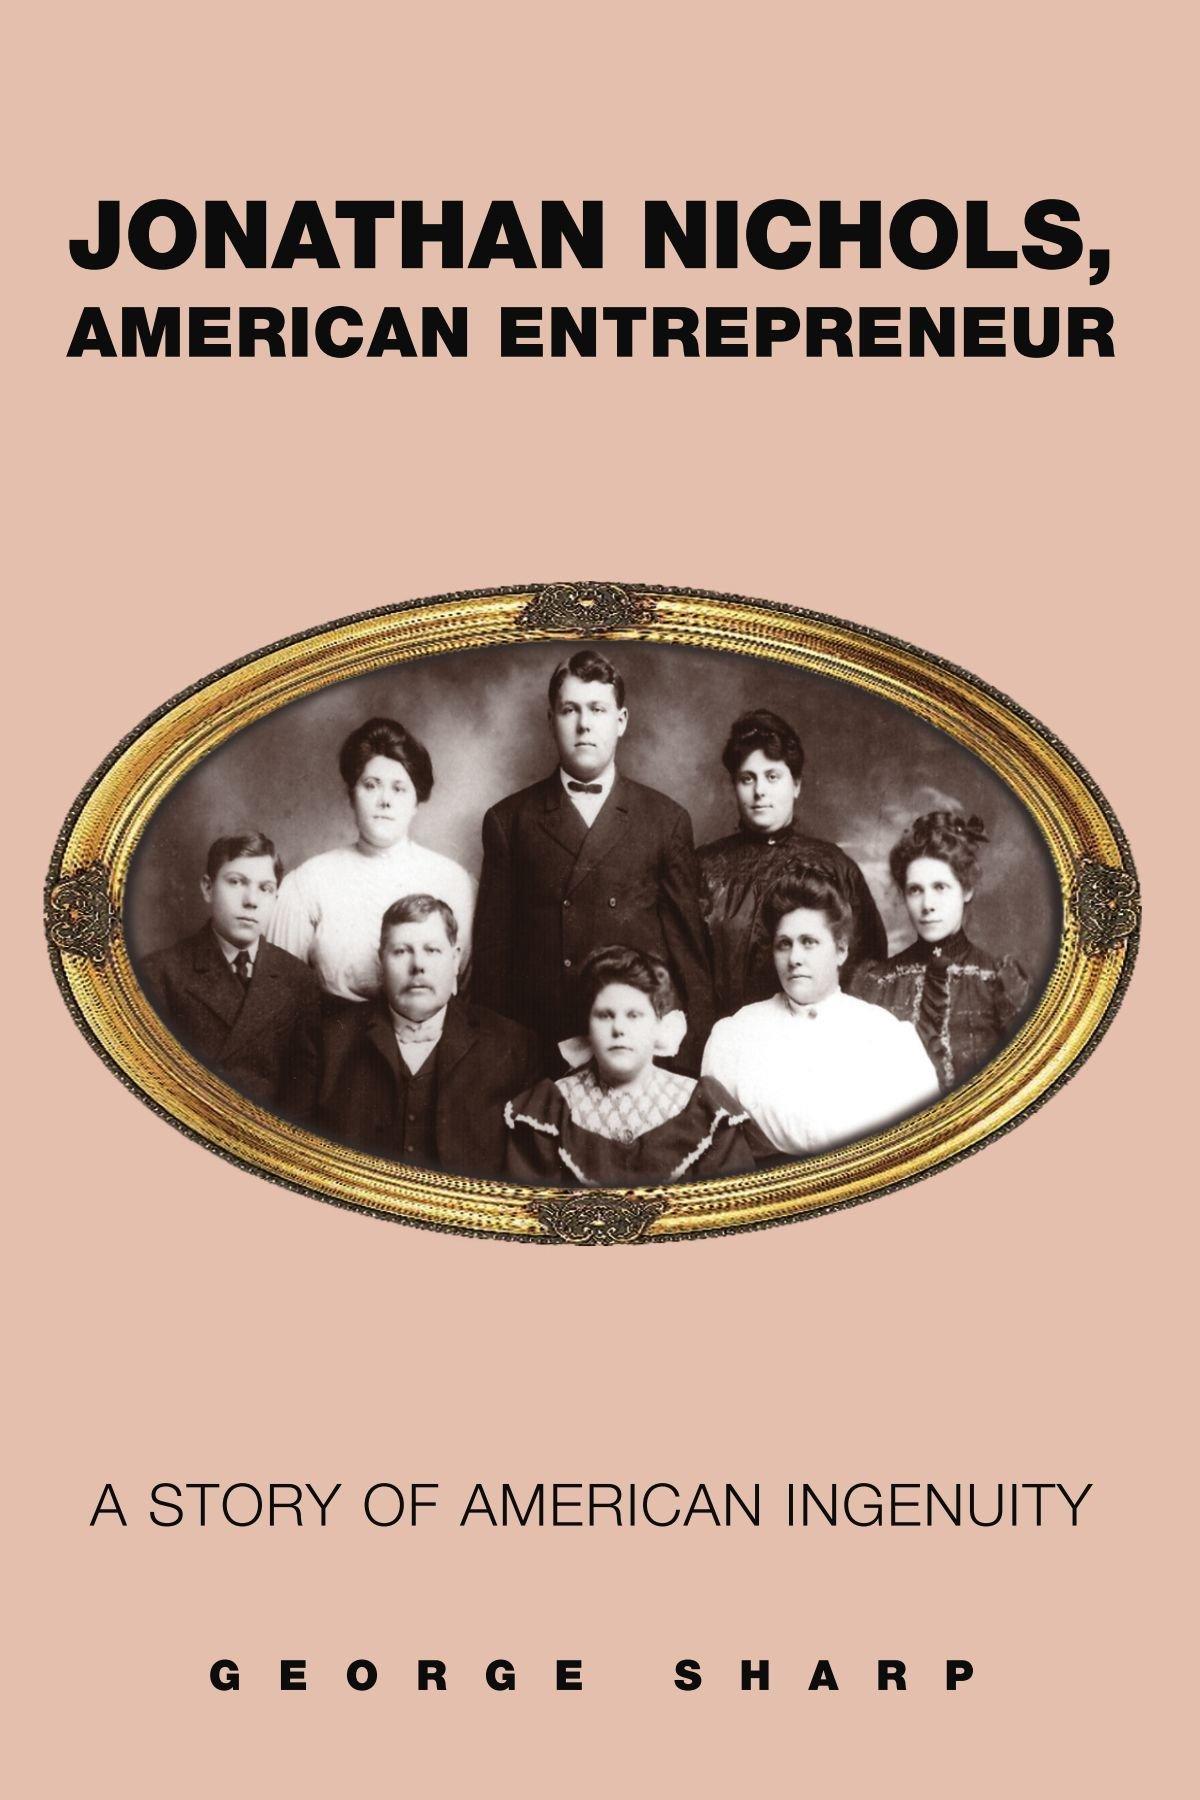 Download Jonathan Nichols, American Entrepreneur: A STORY OF AMERICAN INGENUITY pdf epub